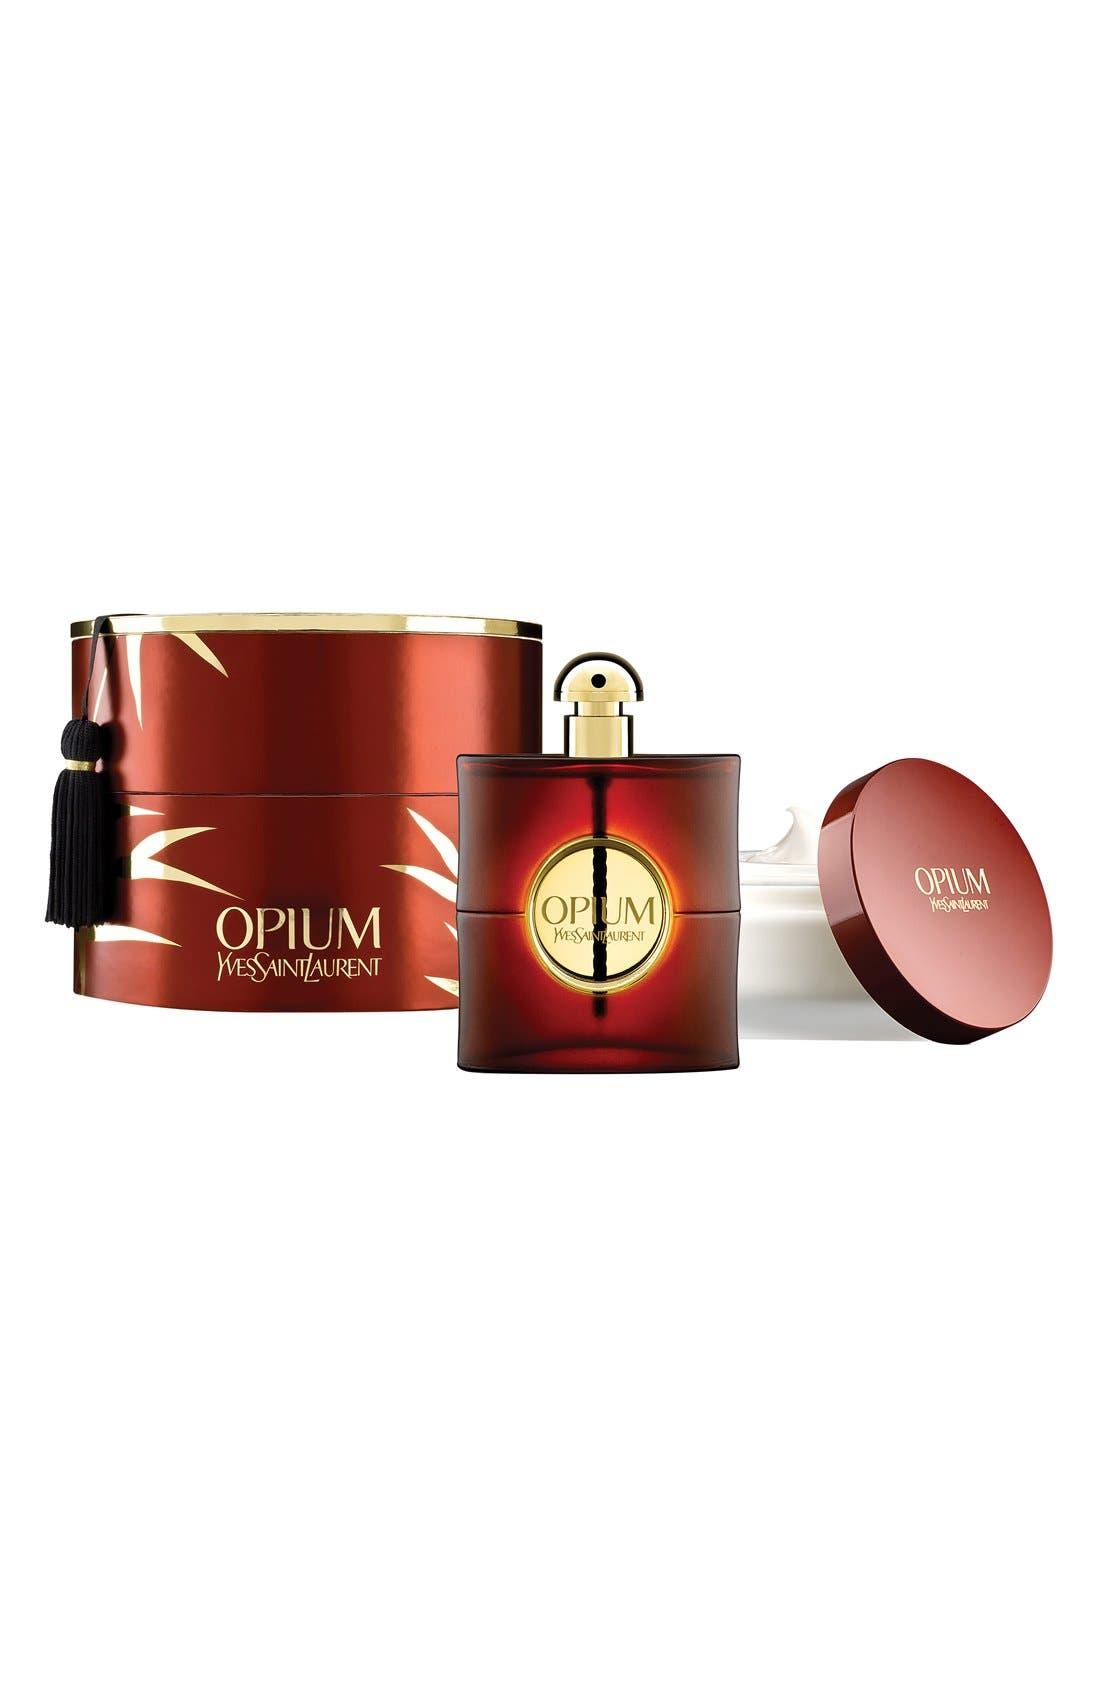 Yves Saint Laurent Opium Eau de Parfum & Body Cream Set ($192 Value)